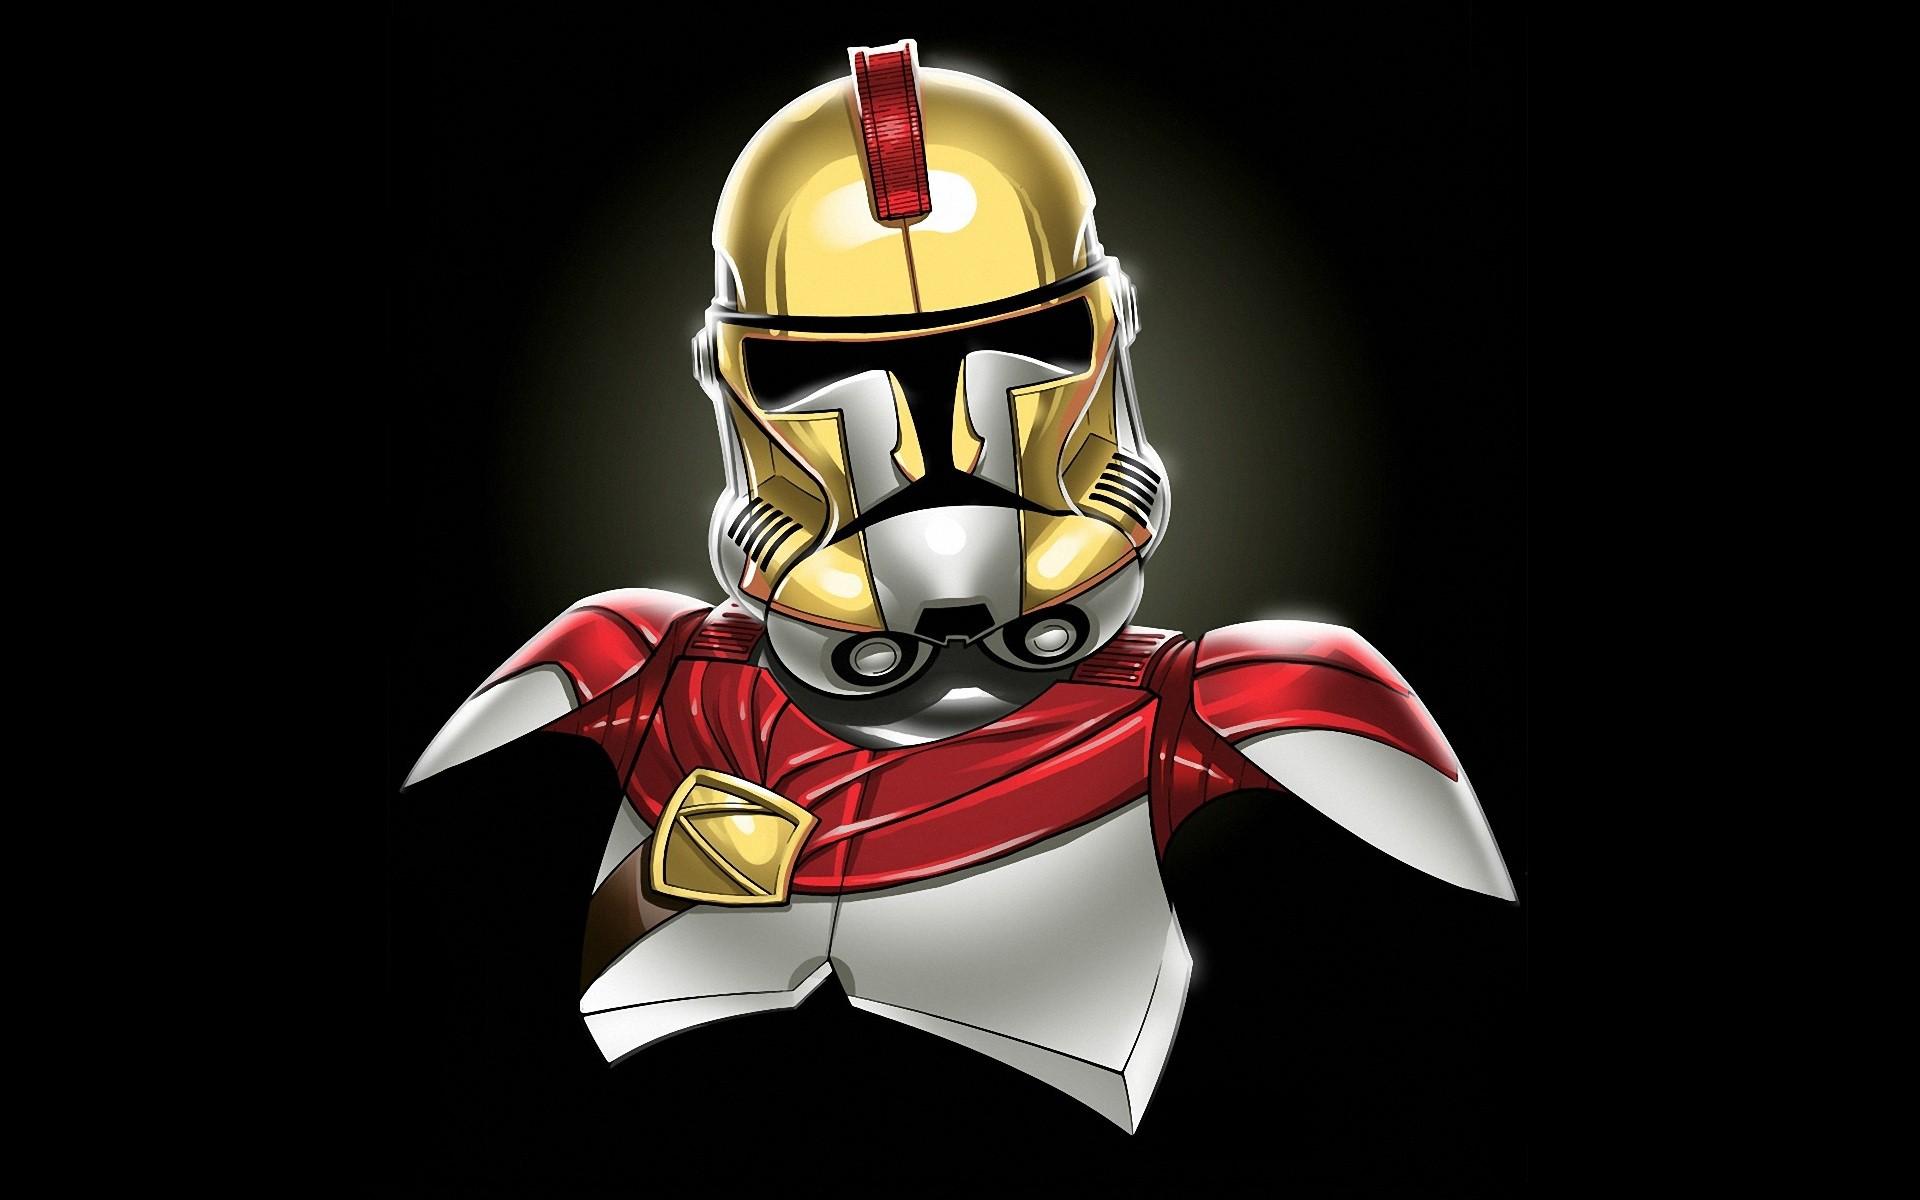 Wolverine Animated Hd Wallpapers Star Wars Minimalistic Movie Leonidas Stormtroopers